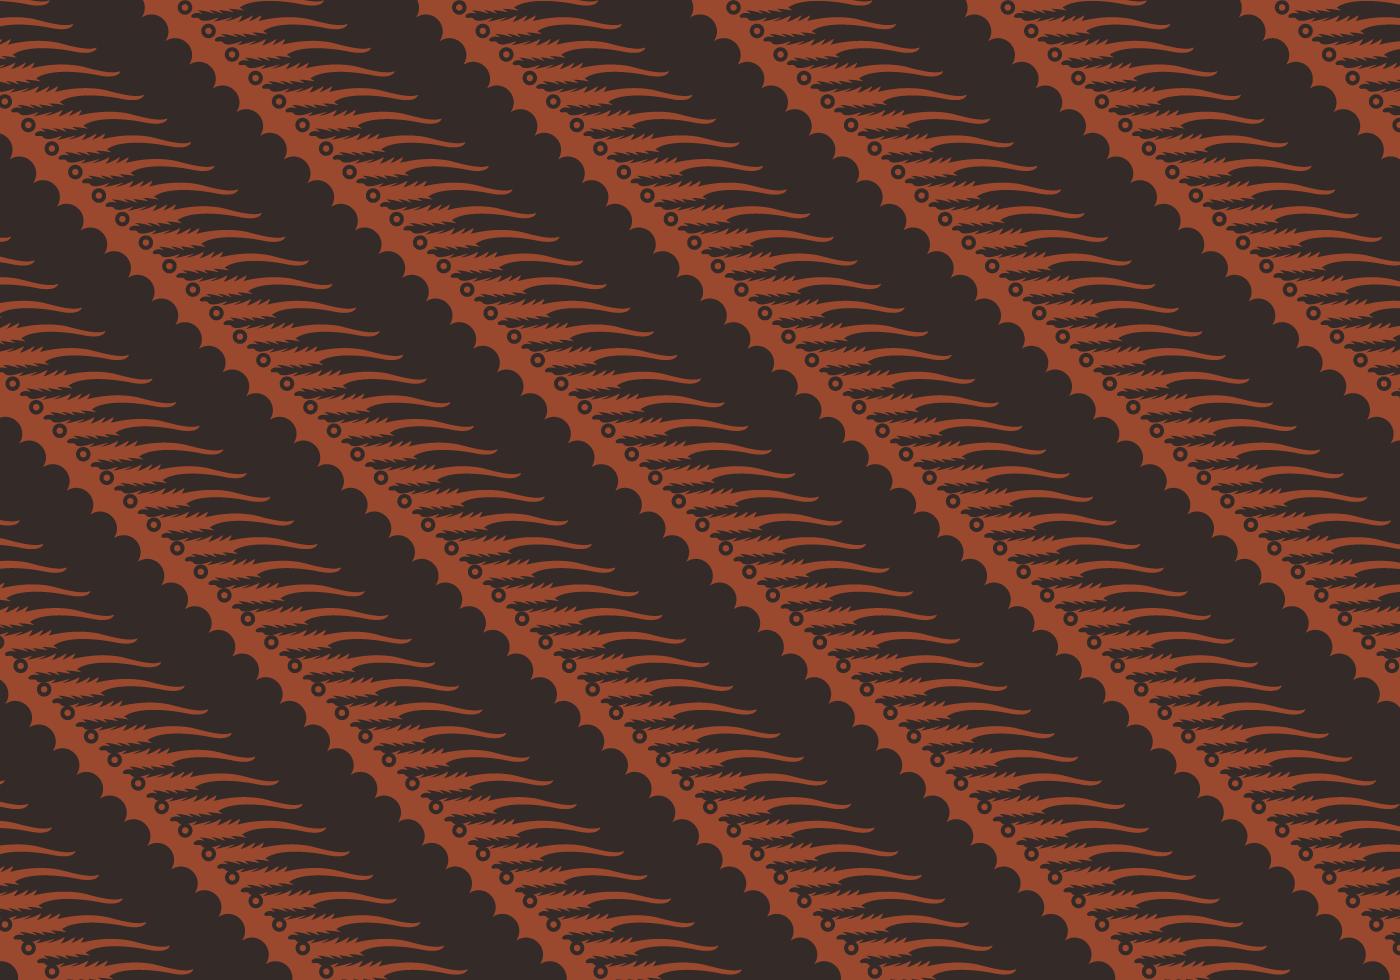 batik background vectors - photo #8